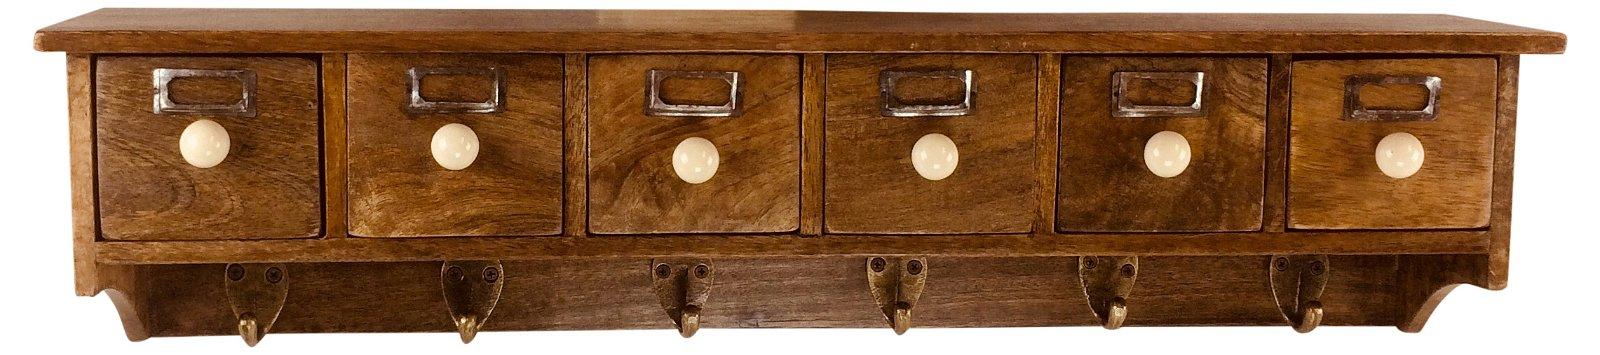 Shelf with 6 Drawers & Hooks